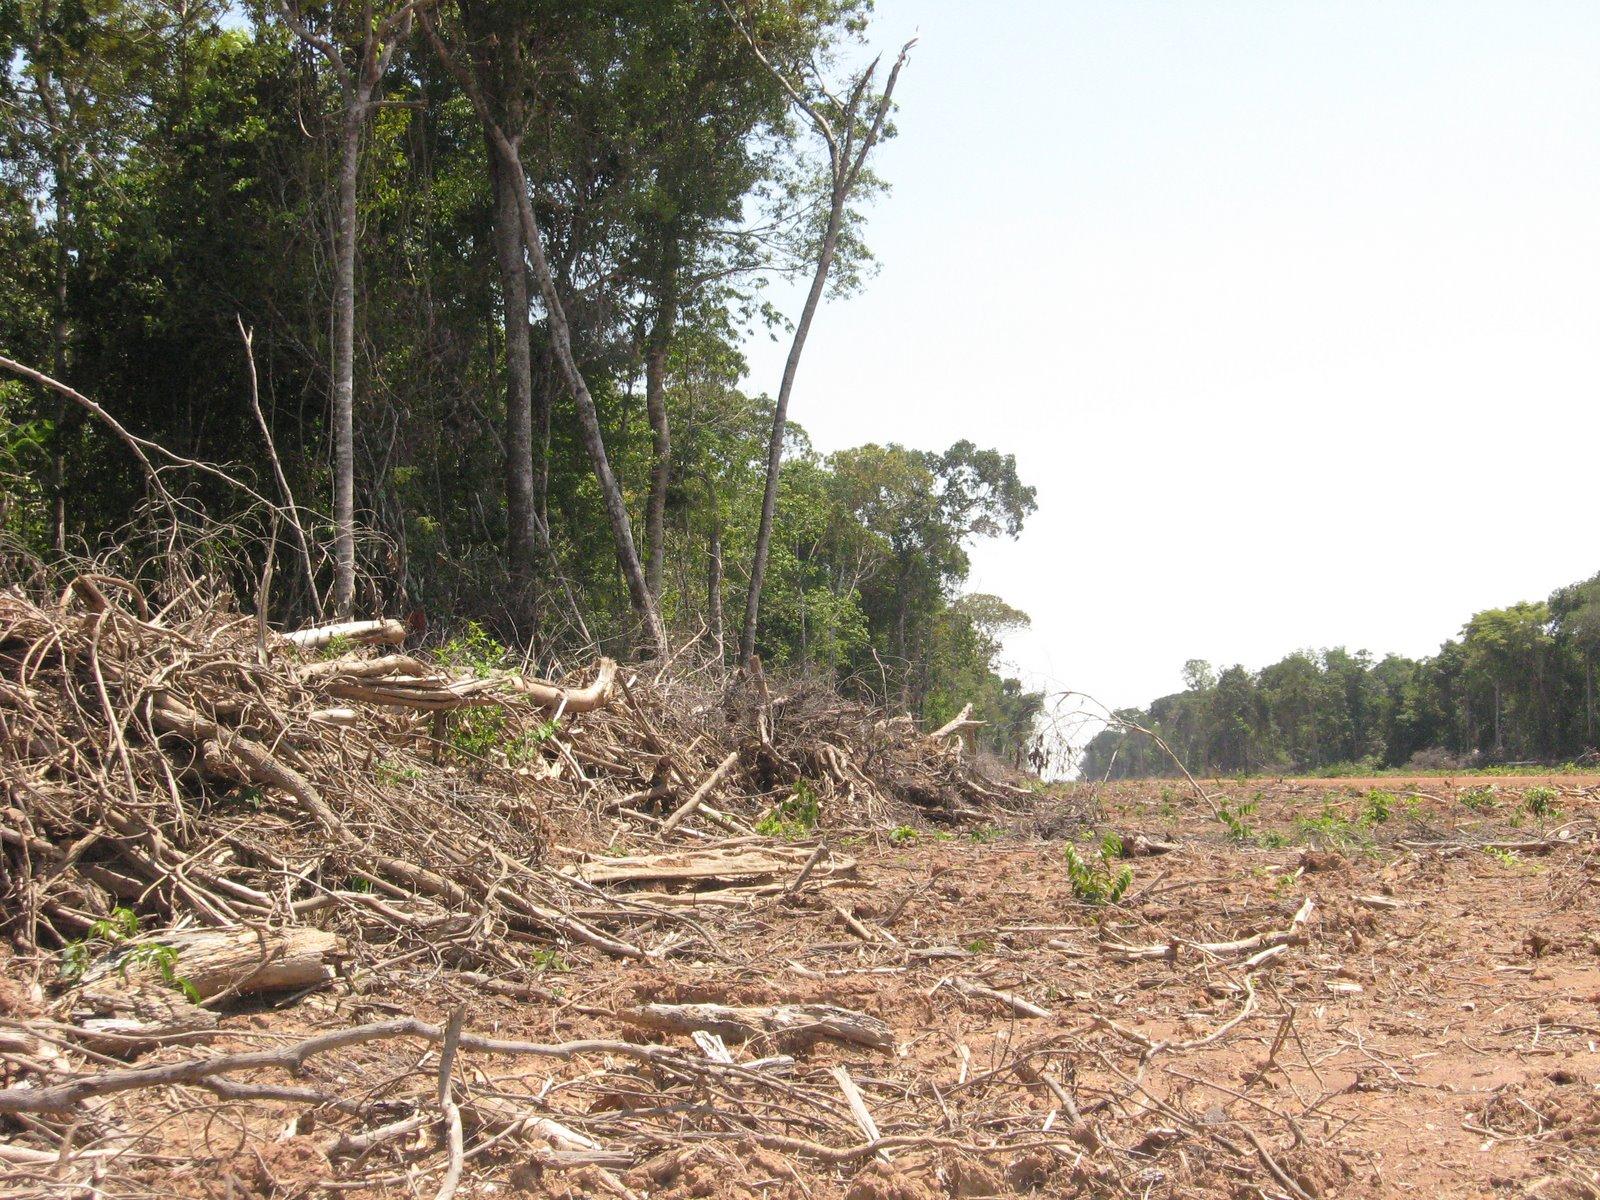 Deforestation in the Amazon, photo by Paulo Brando